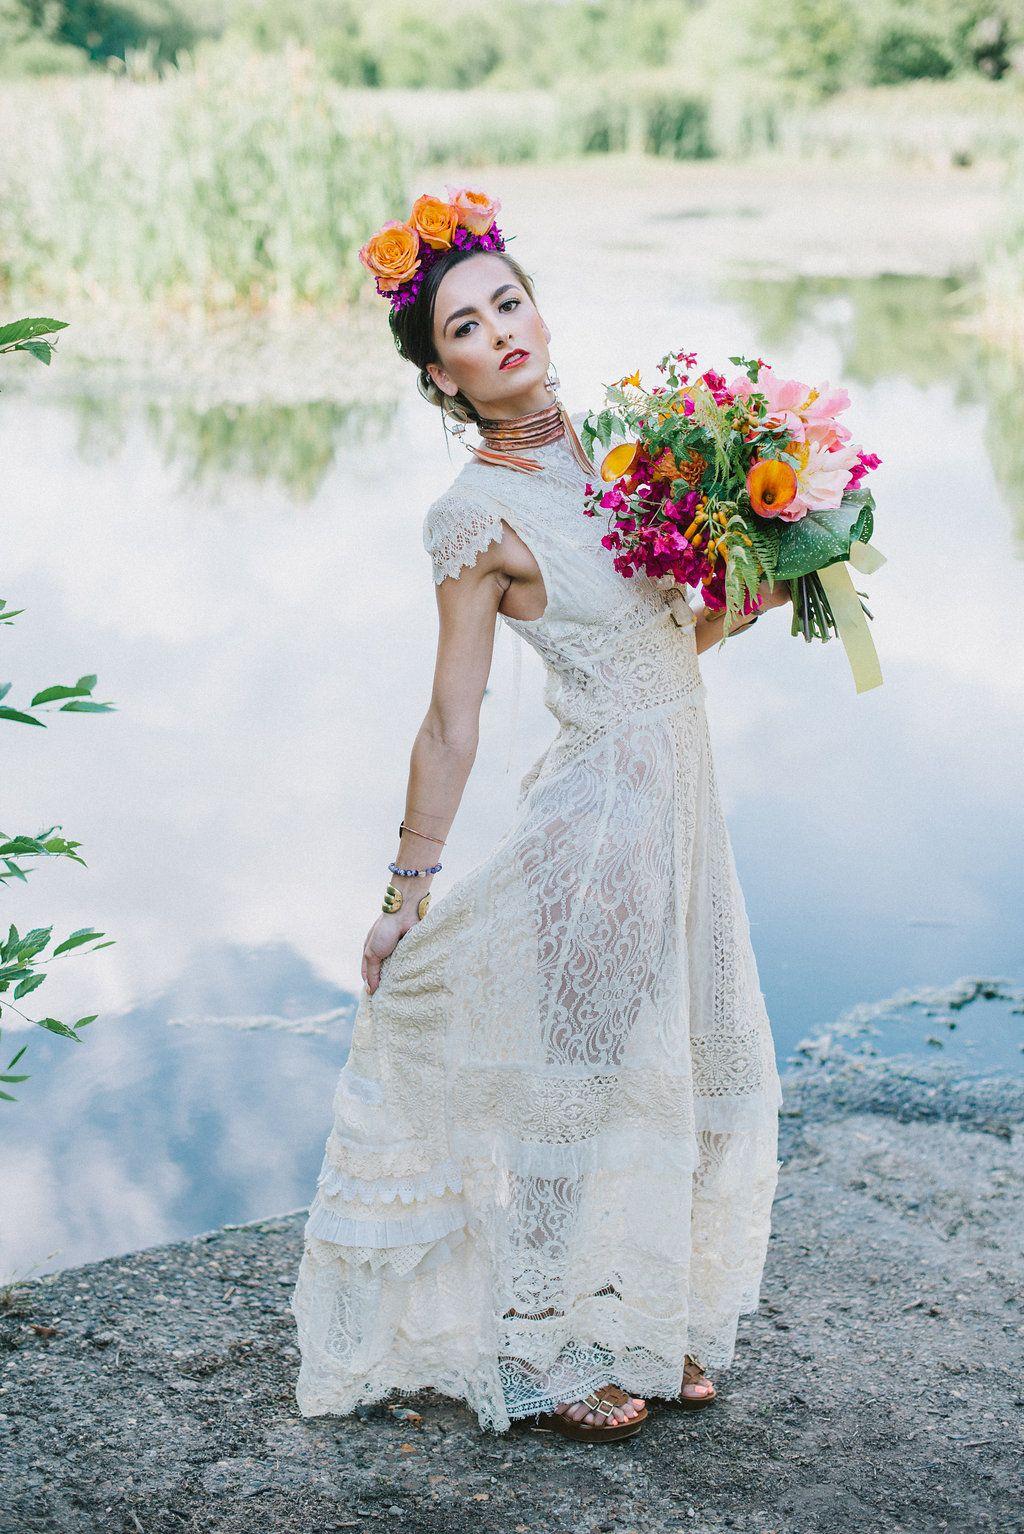 Upcycled Frida Kahlo inspired wedding dress by Crystena Hemingway of ...